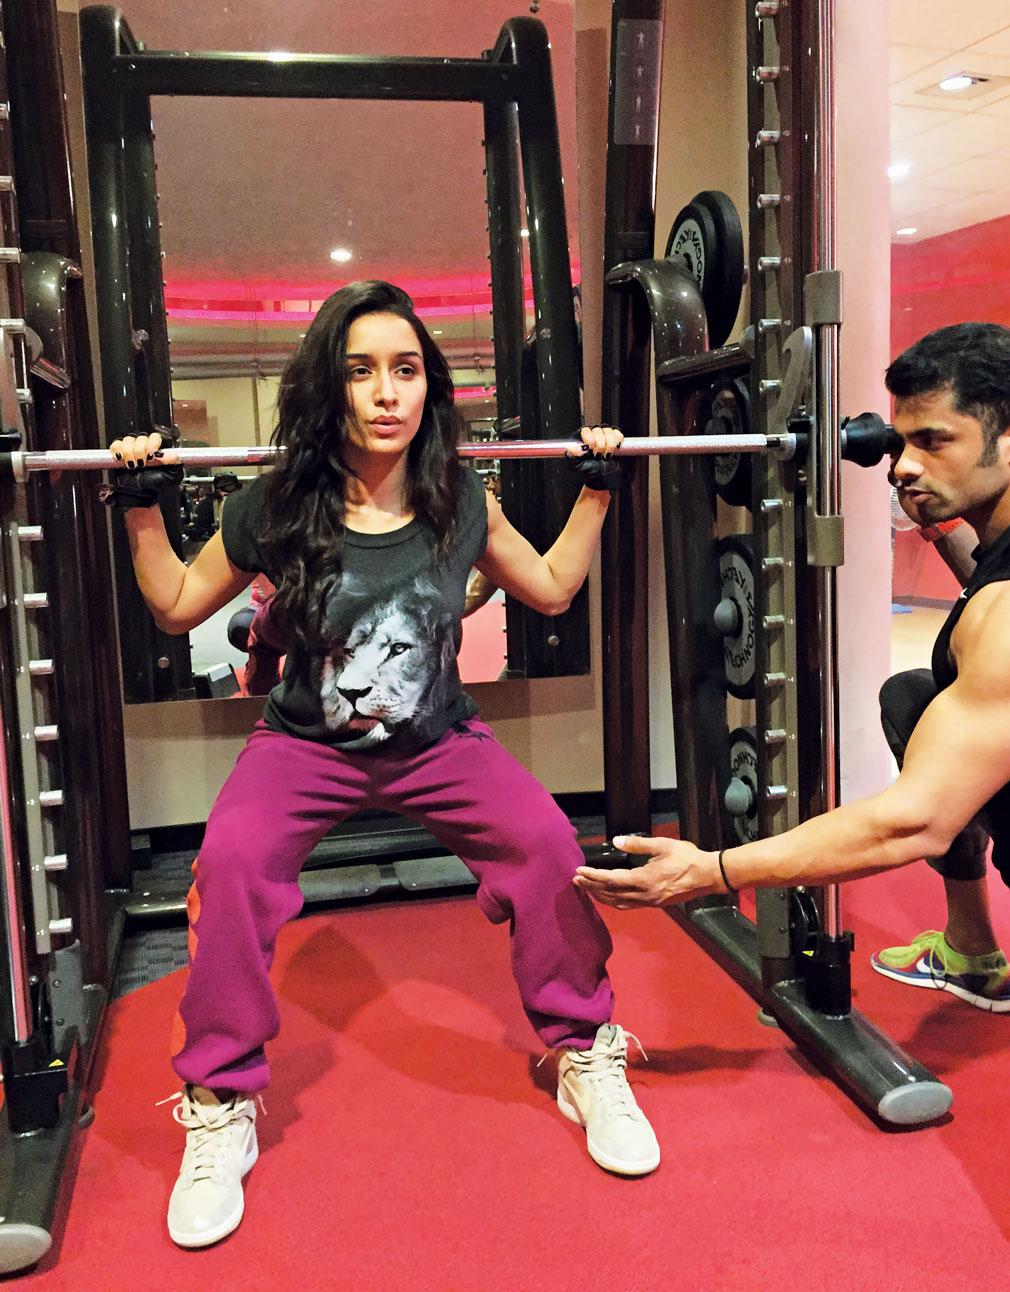 PunjabKesari, Shraddha Kapoor Fitness Image, श्रद्धा का फिटनेस सीक्रेट इमेज